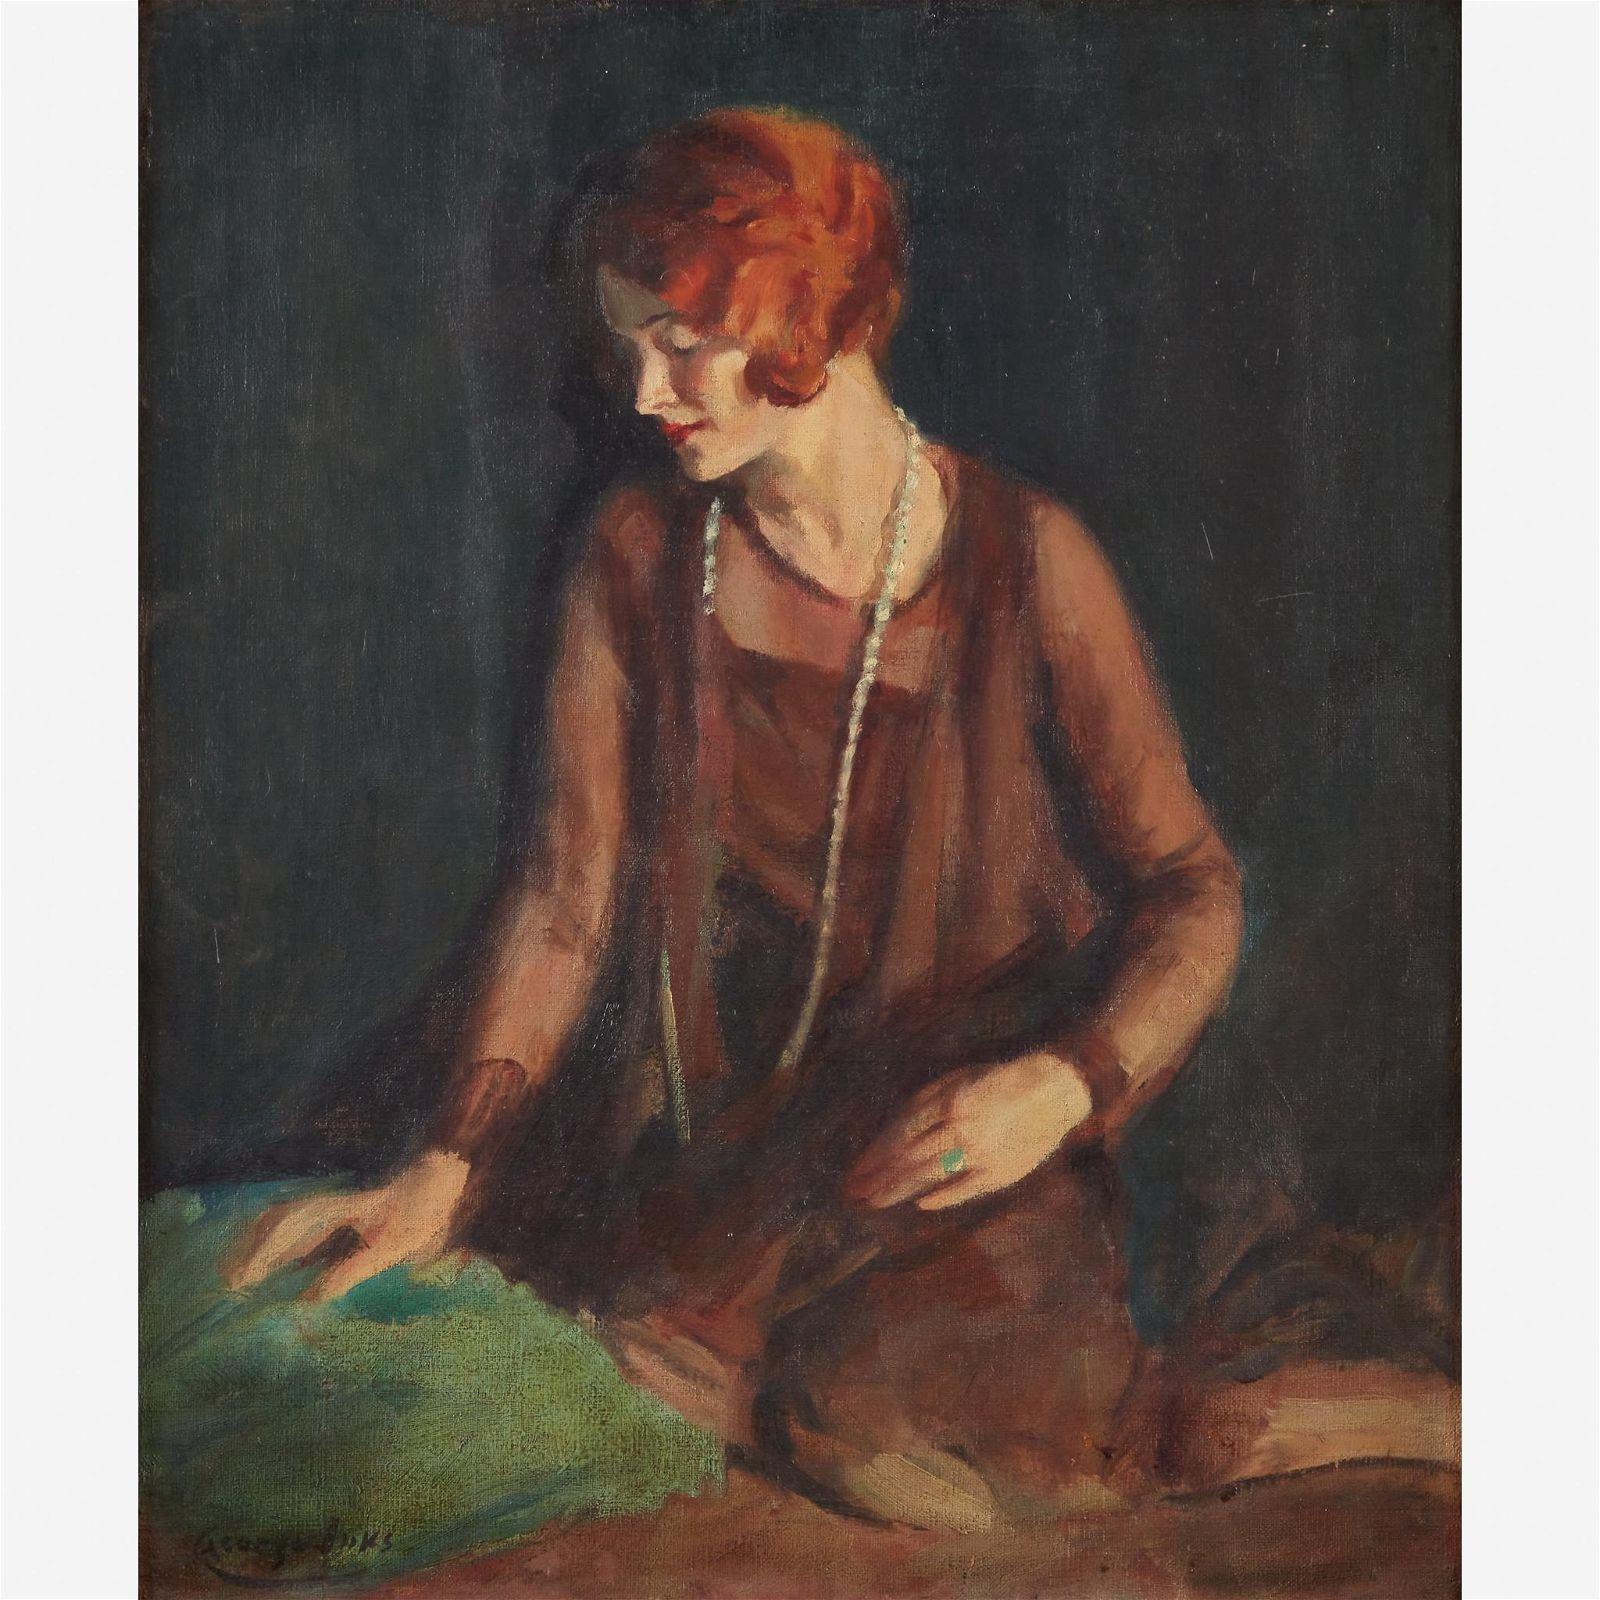 George Benjamin Luks (American, 1867–1933), , The